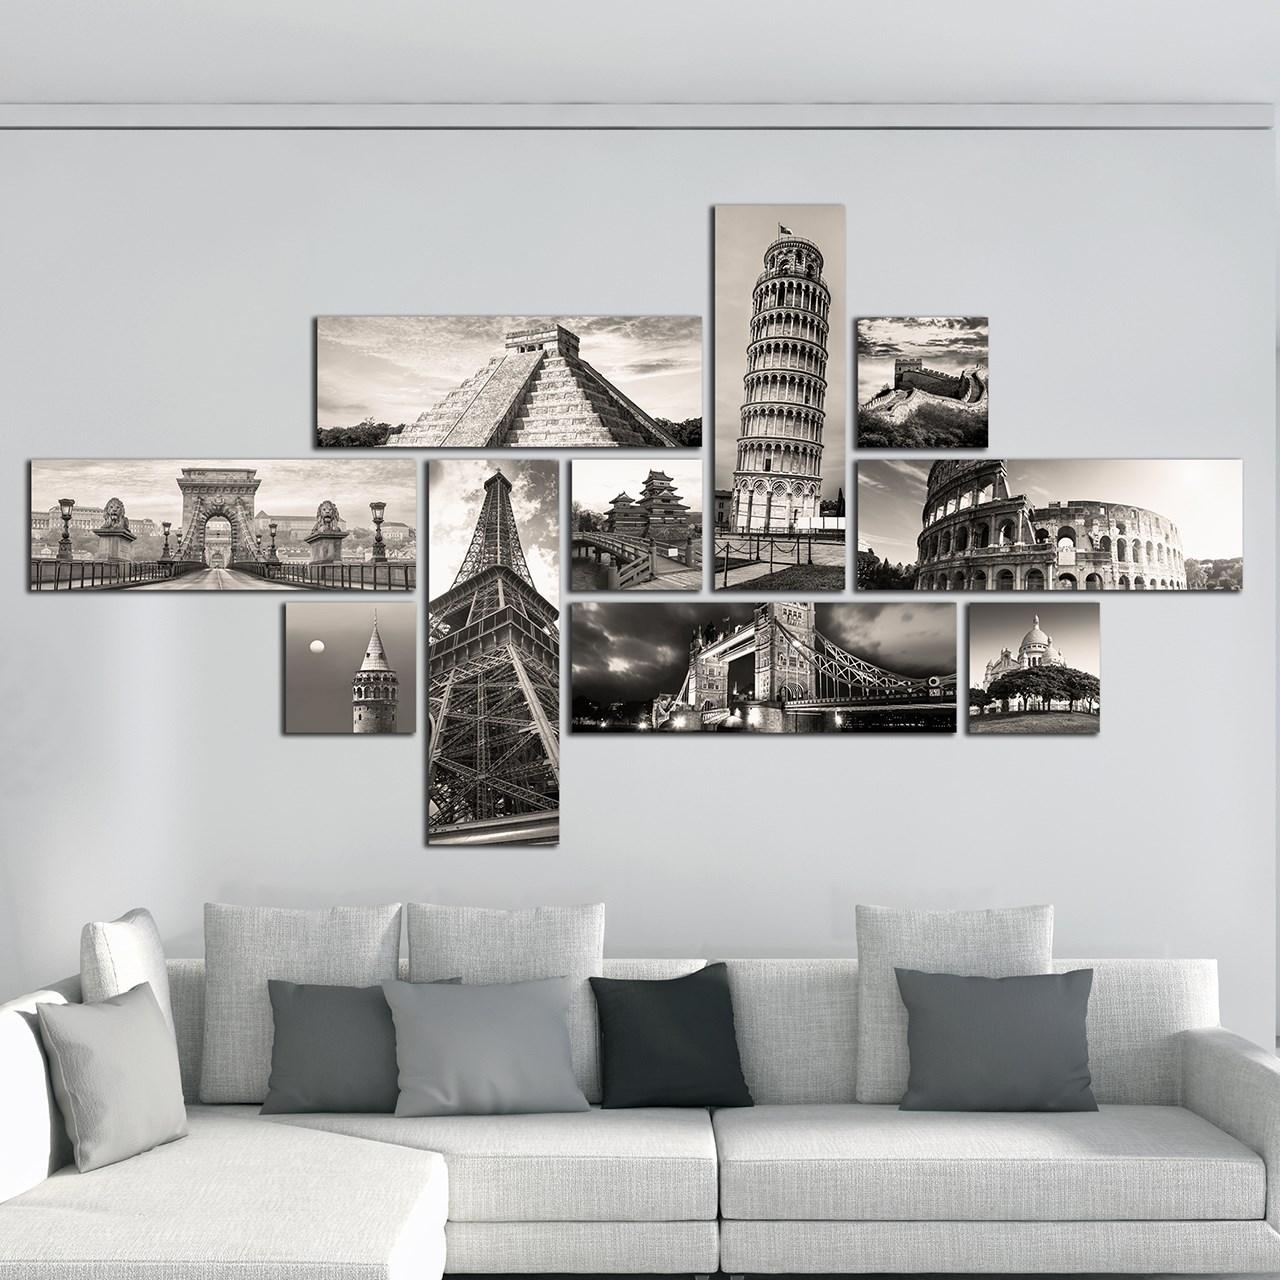 تابلو دیواری 10 تکه آفتاب کد TA5701